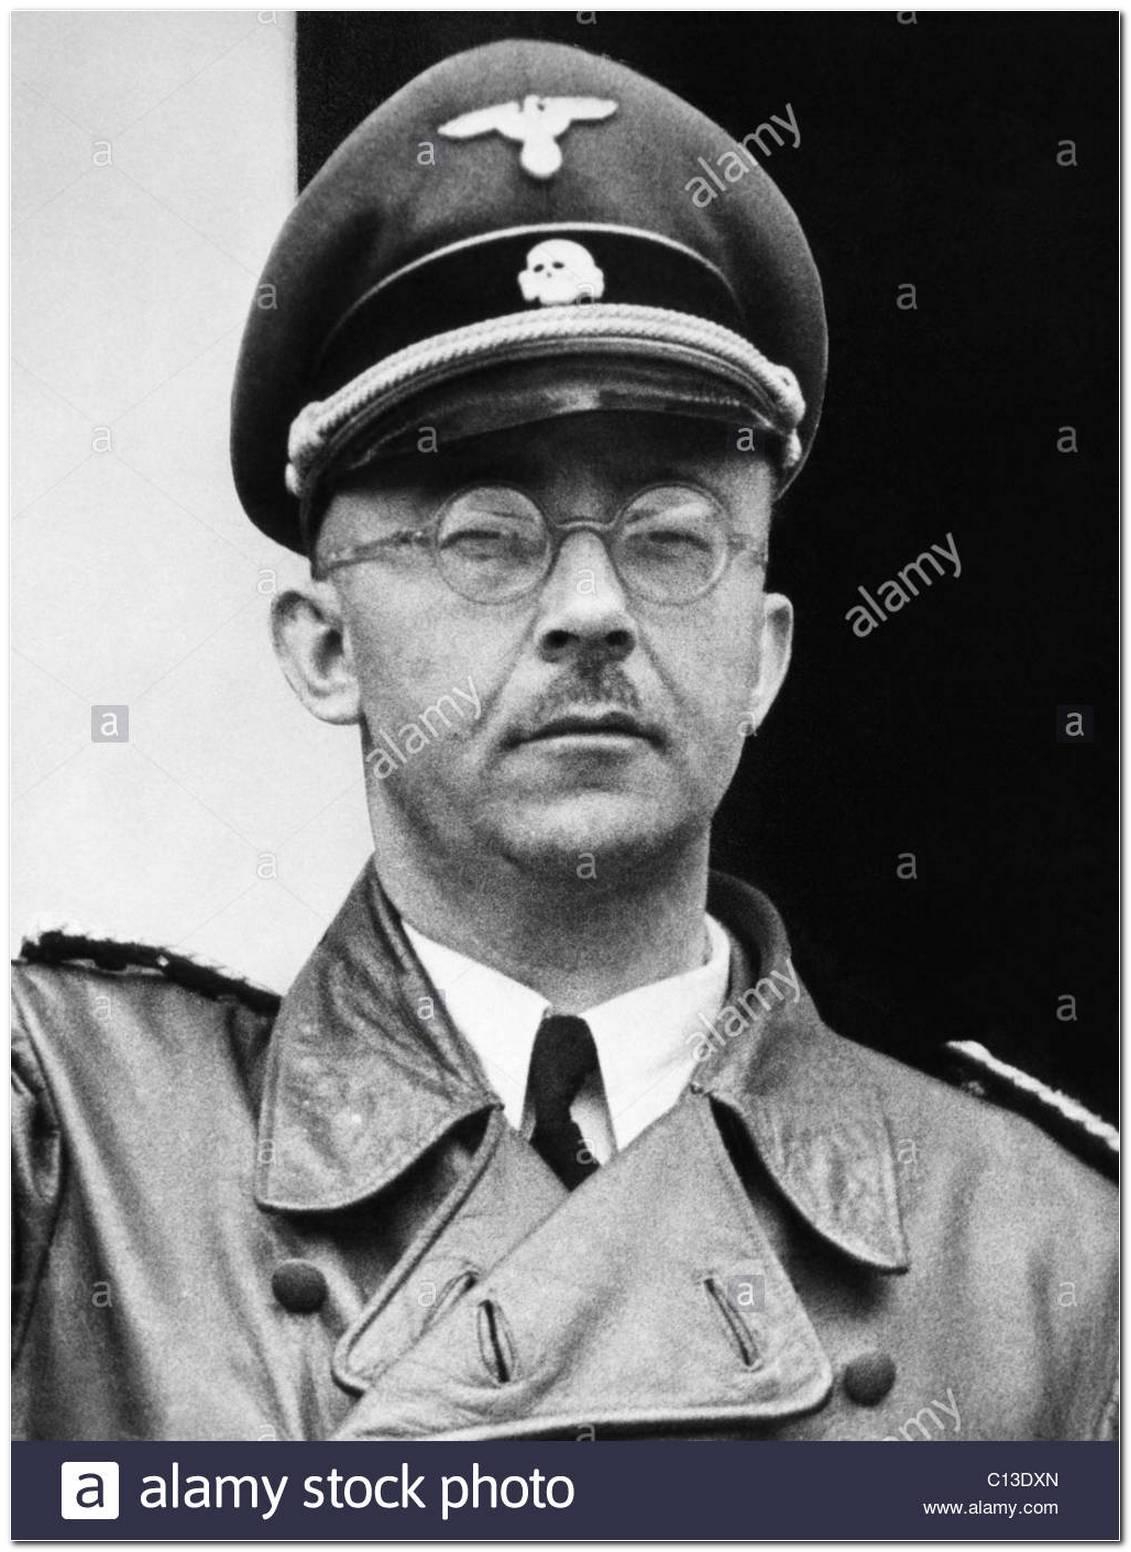 Frisur Heinrich Himmler